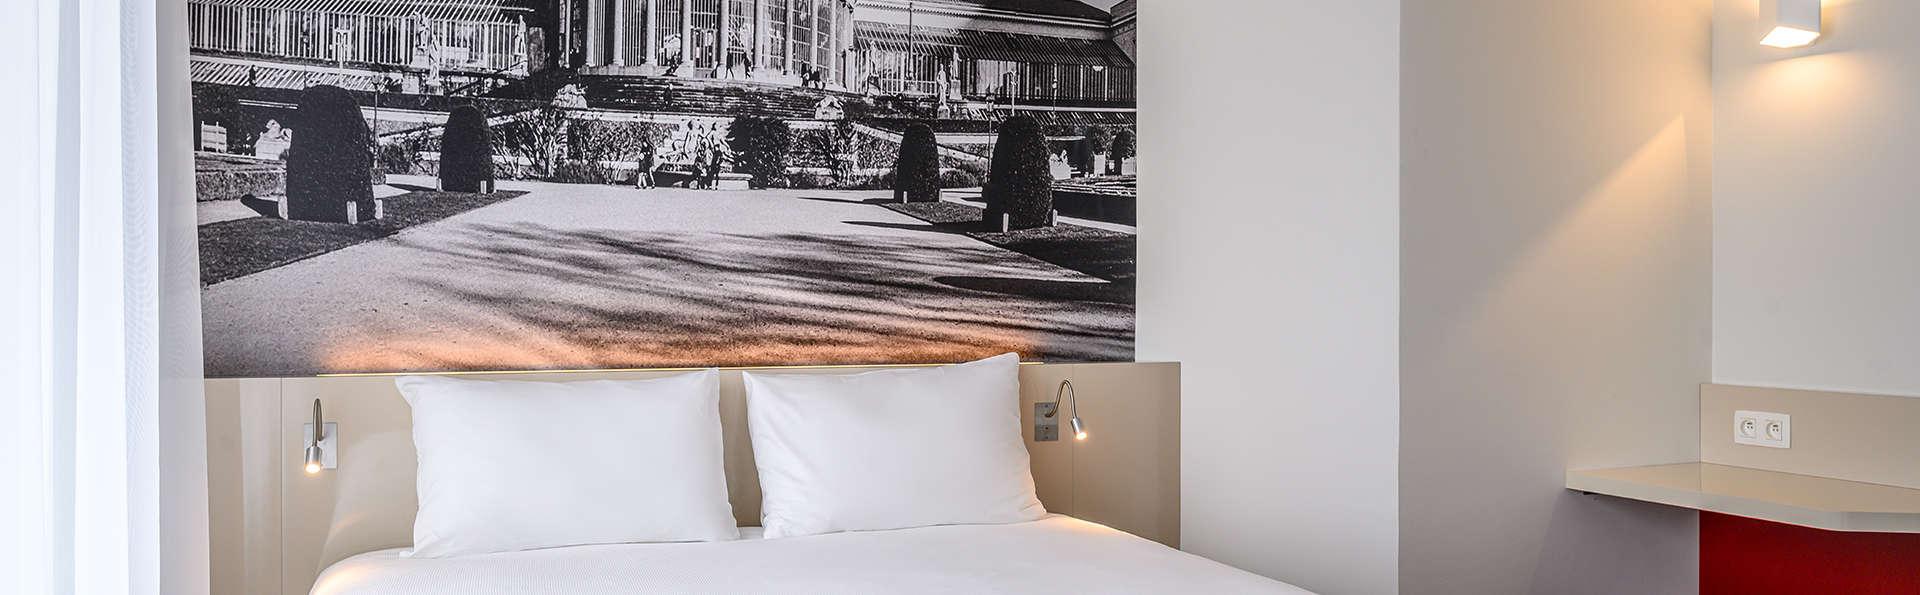 B&B Hotel Gent Centrum - EDIT_Double_-_Bed_3.jpg